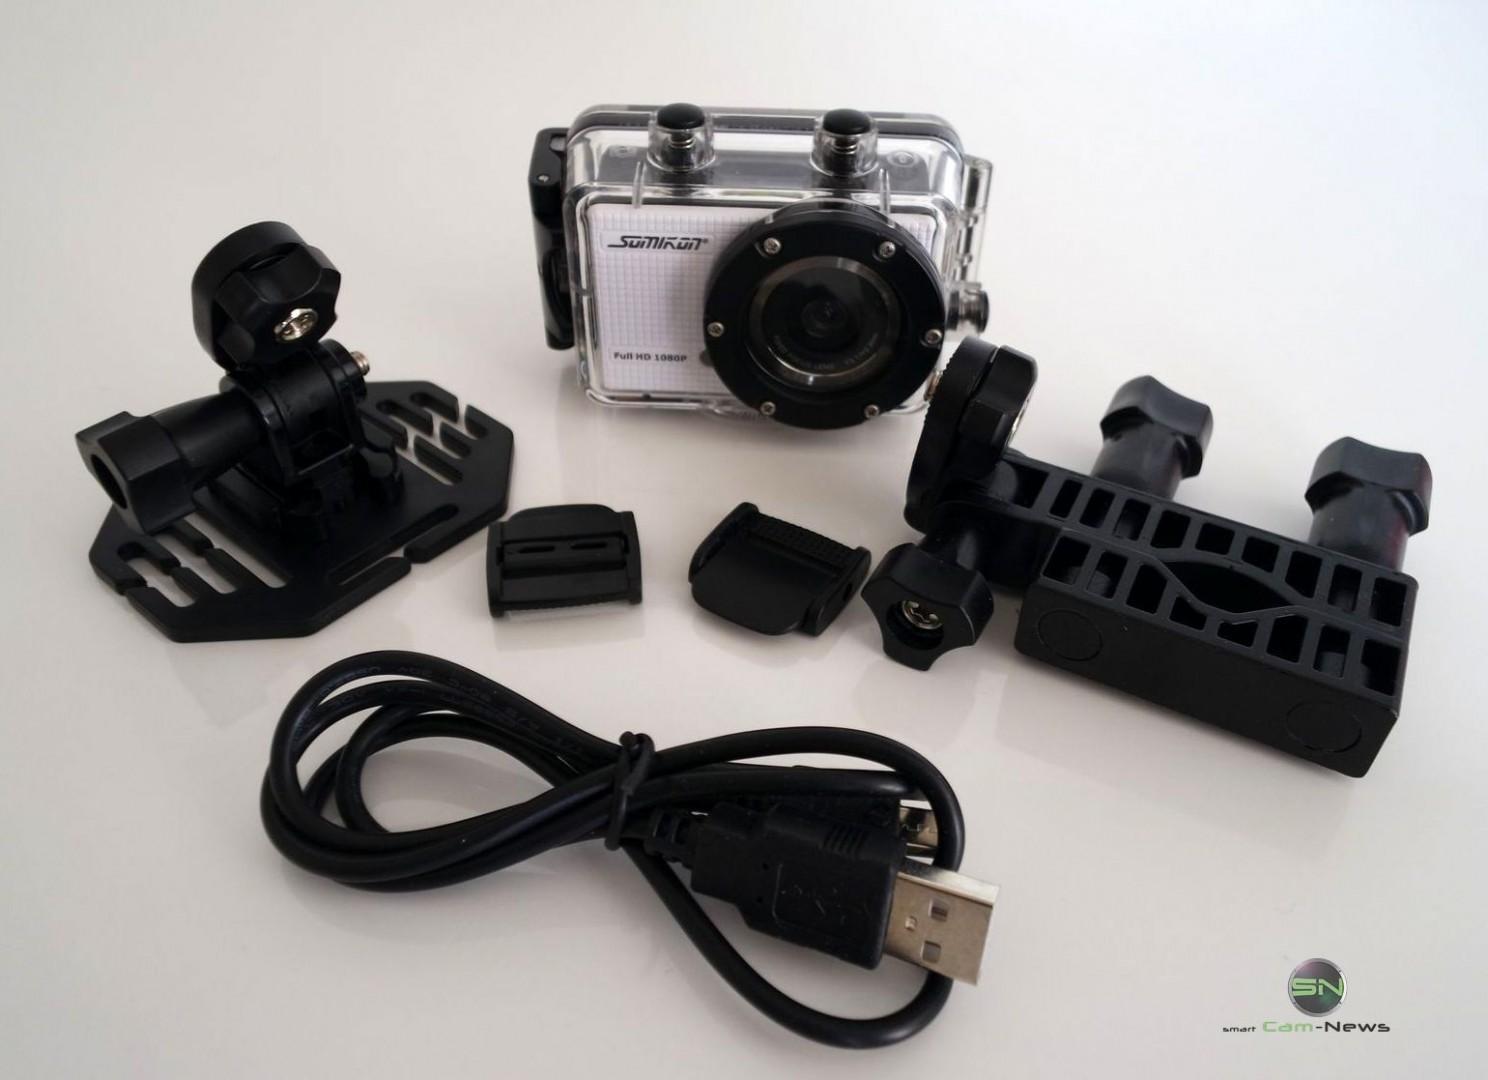 Lieferumfang - Somikon DV800Wifi - SmartCamNews